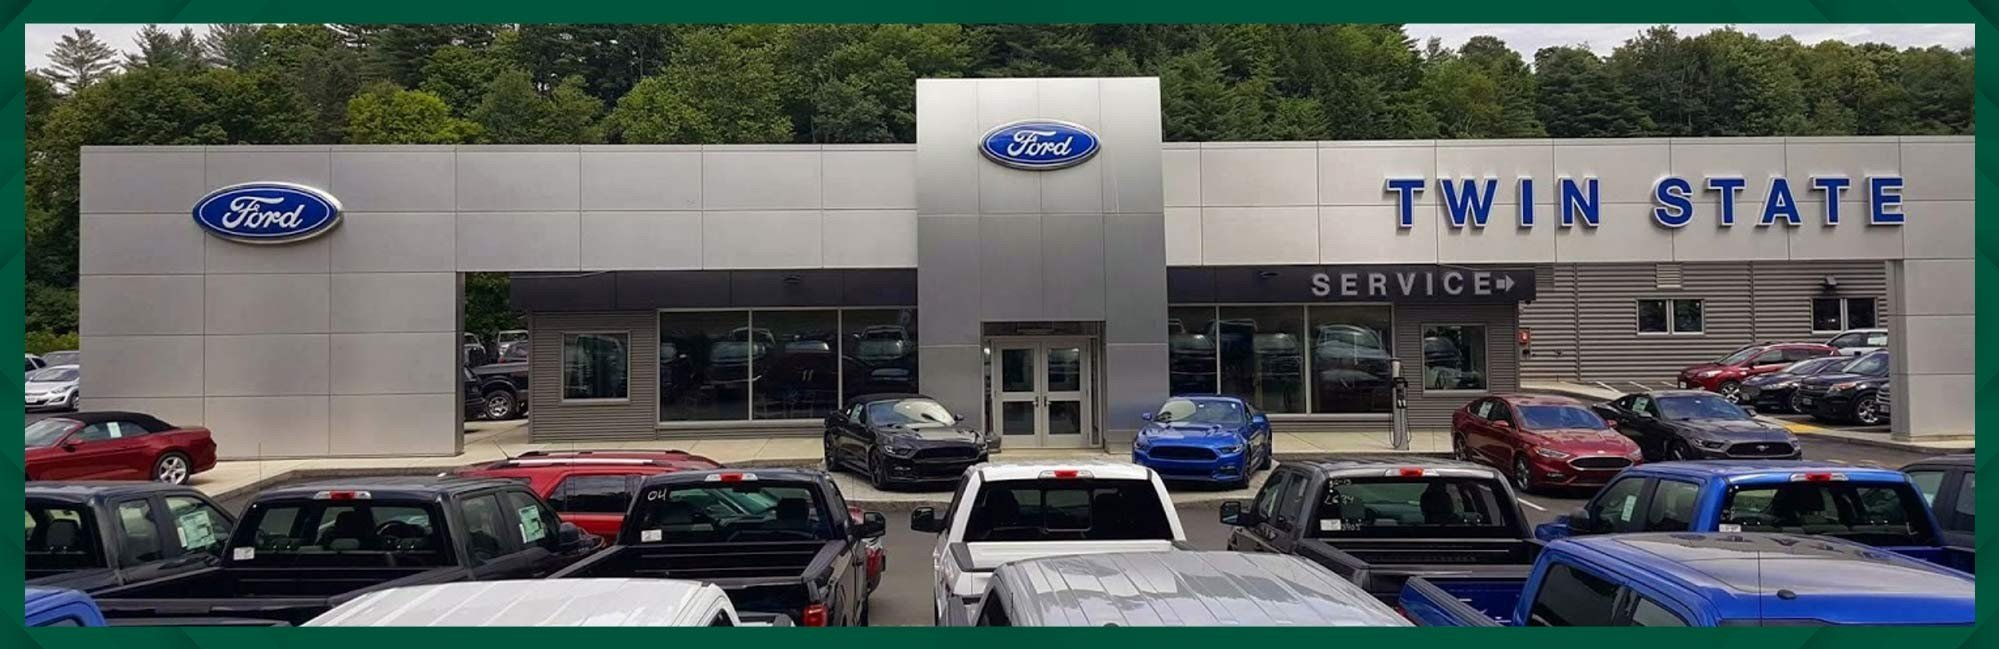 Ford dealer near Barre, VT